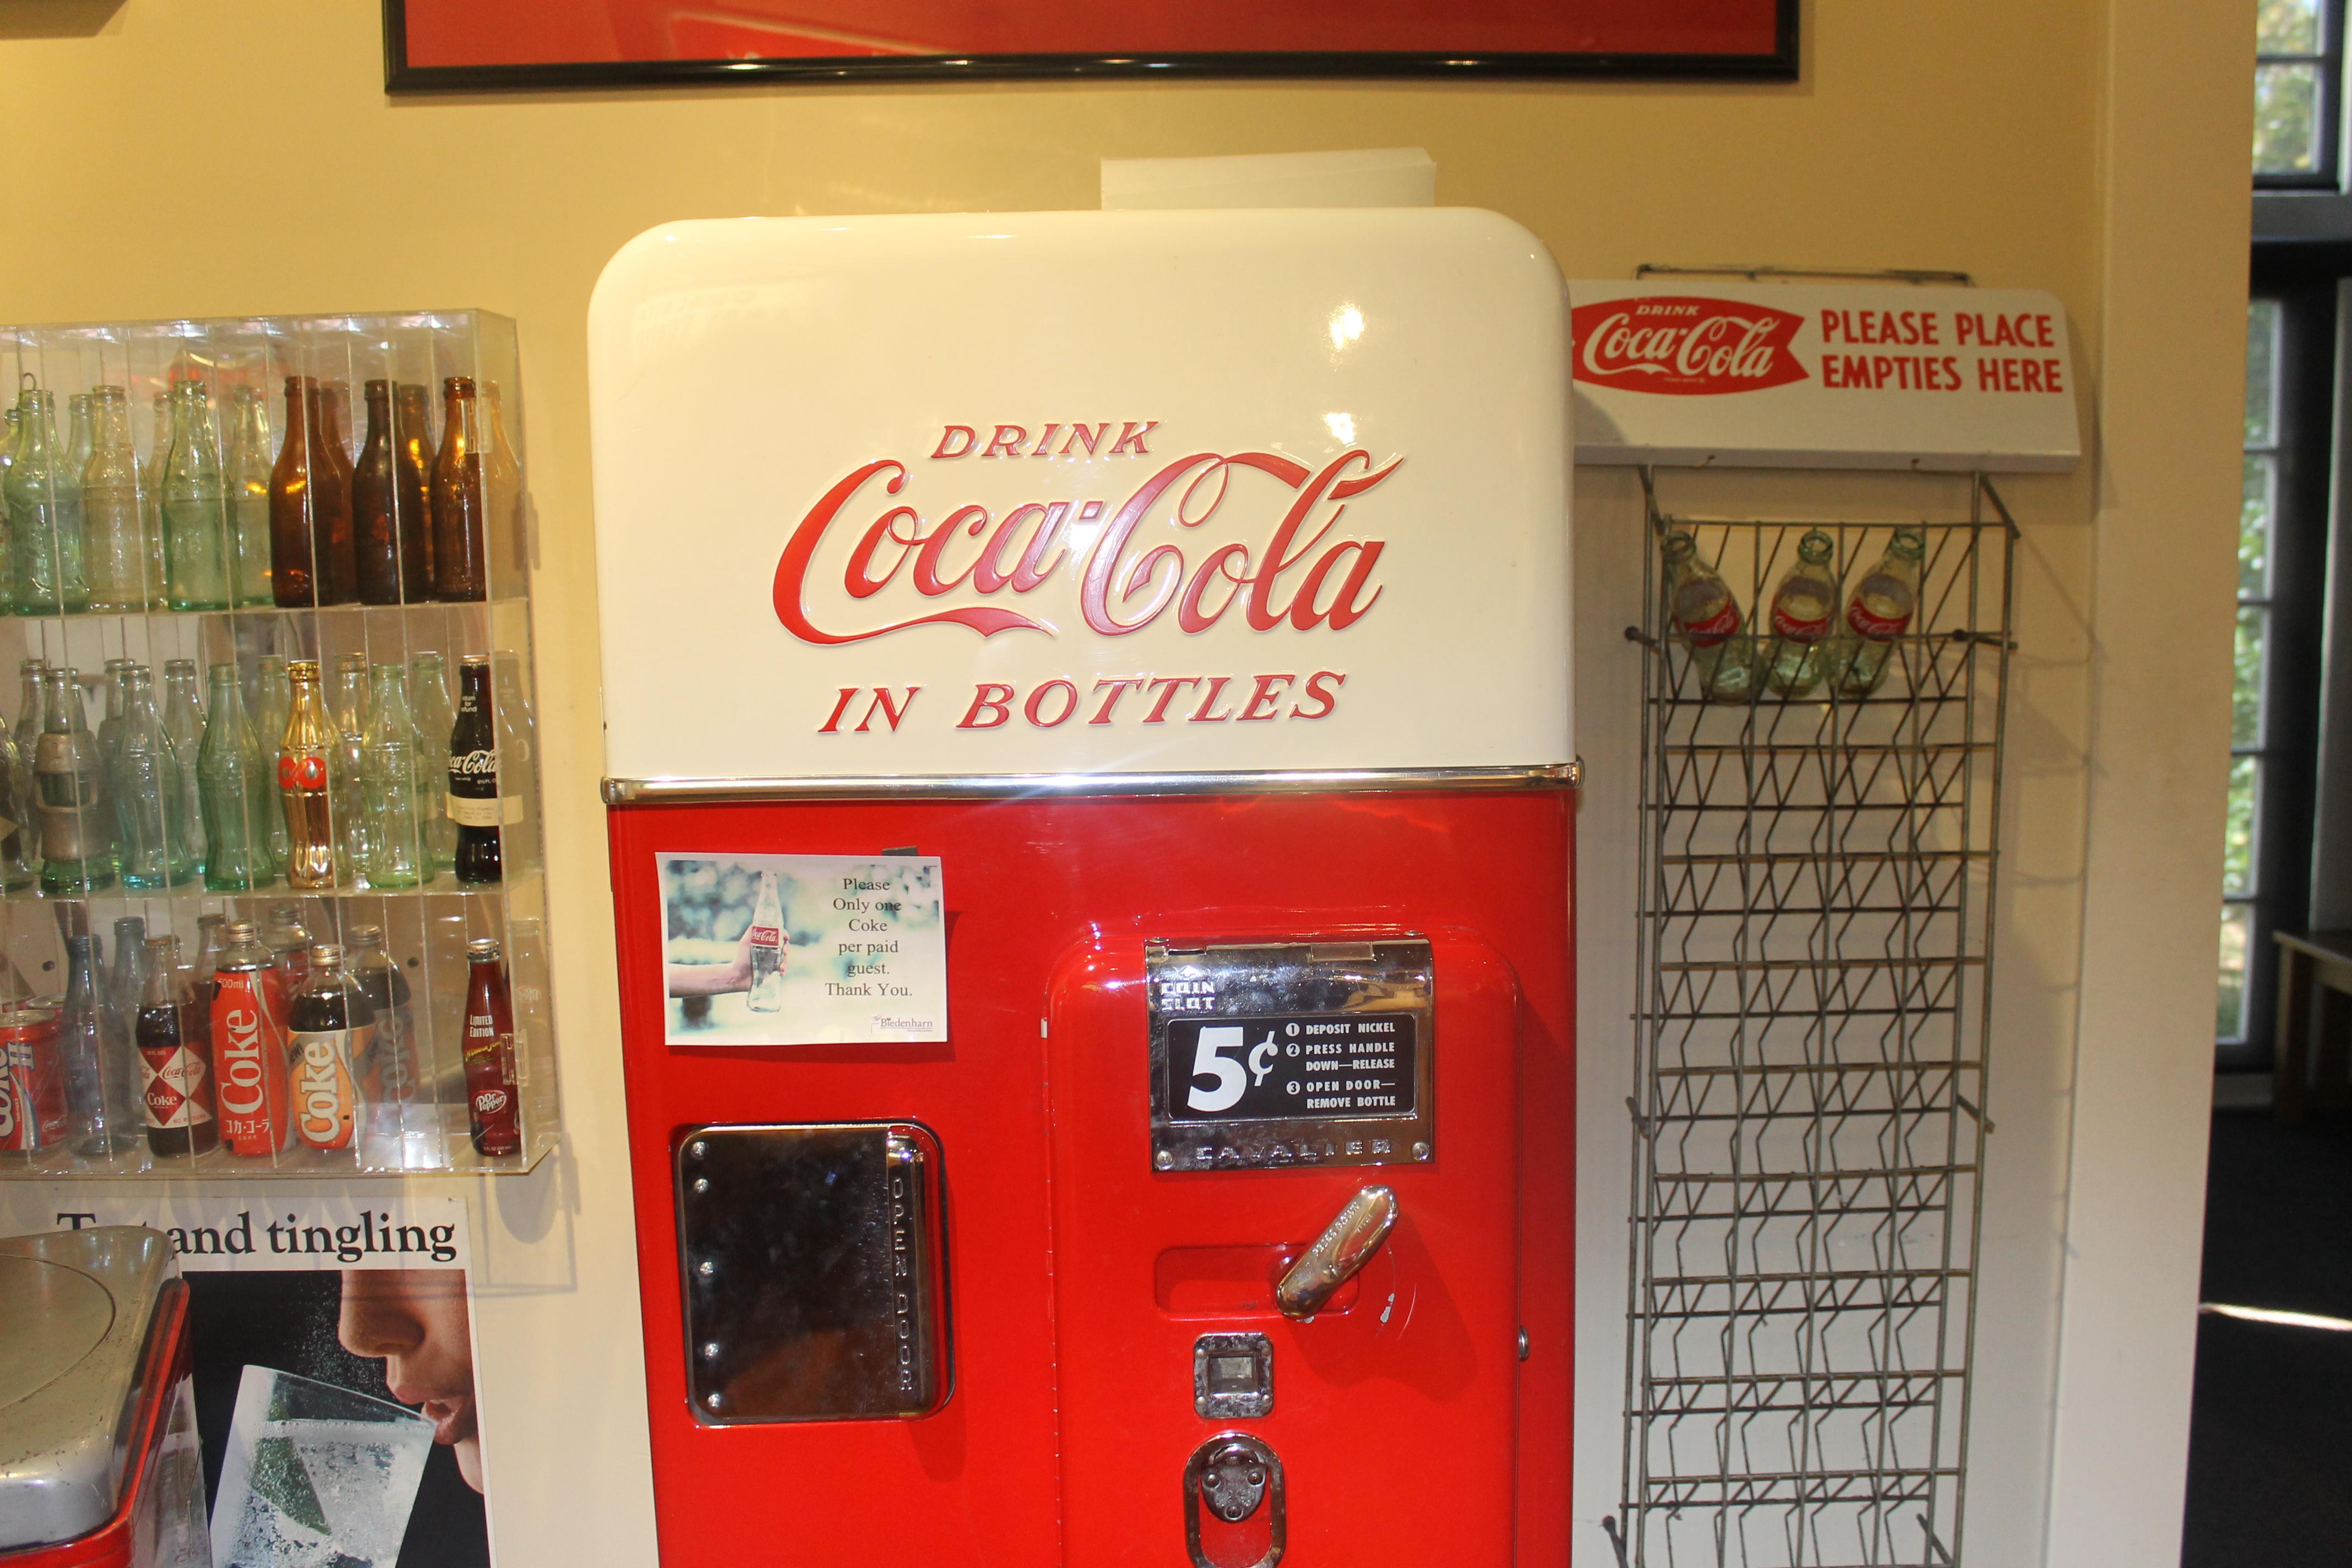 Head Tingling From Coke